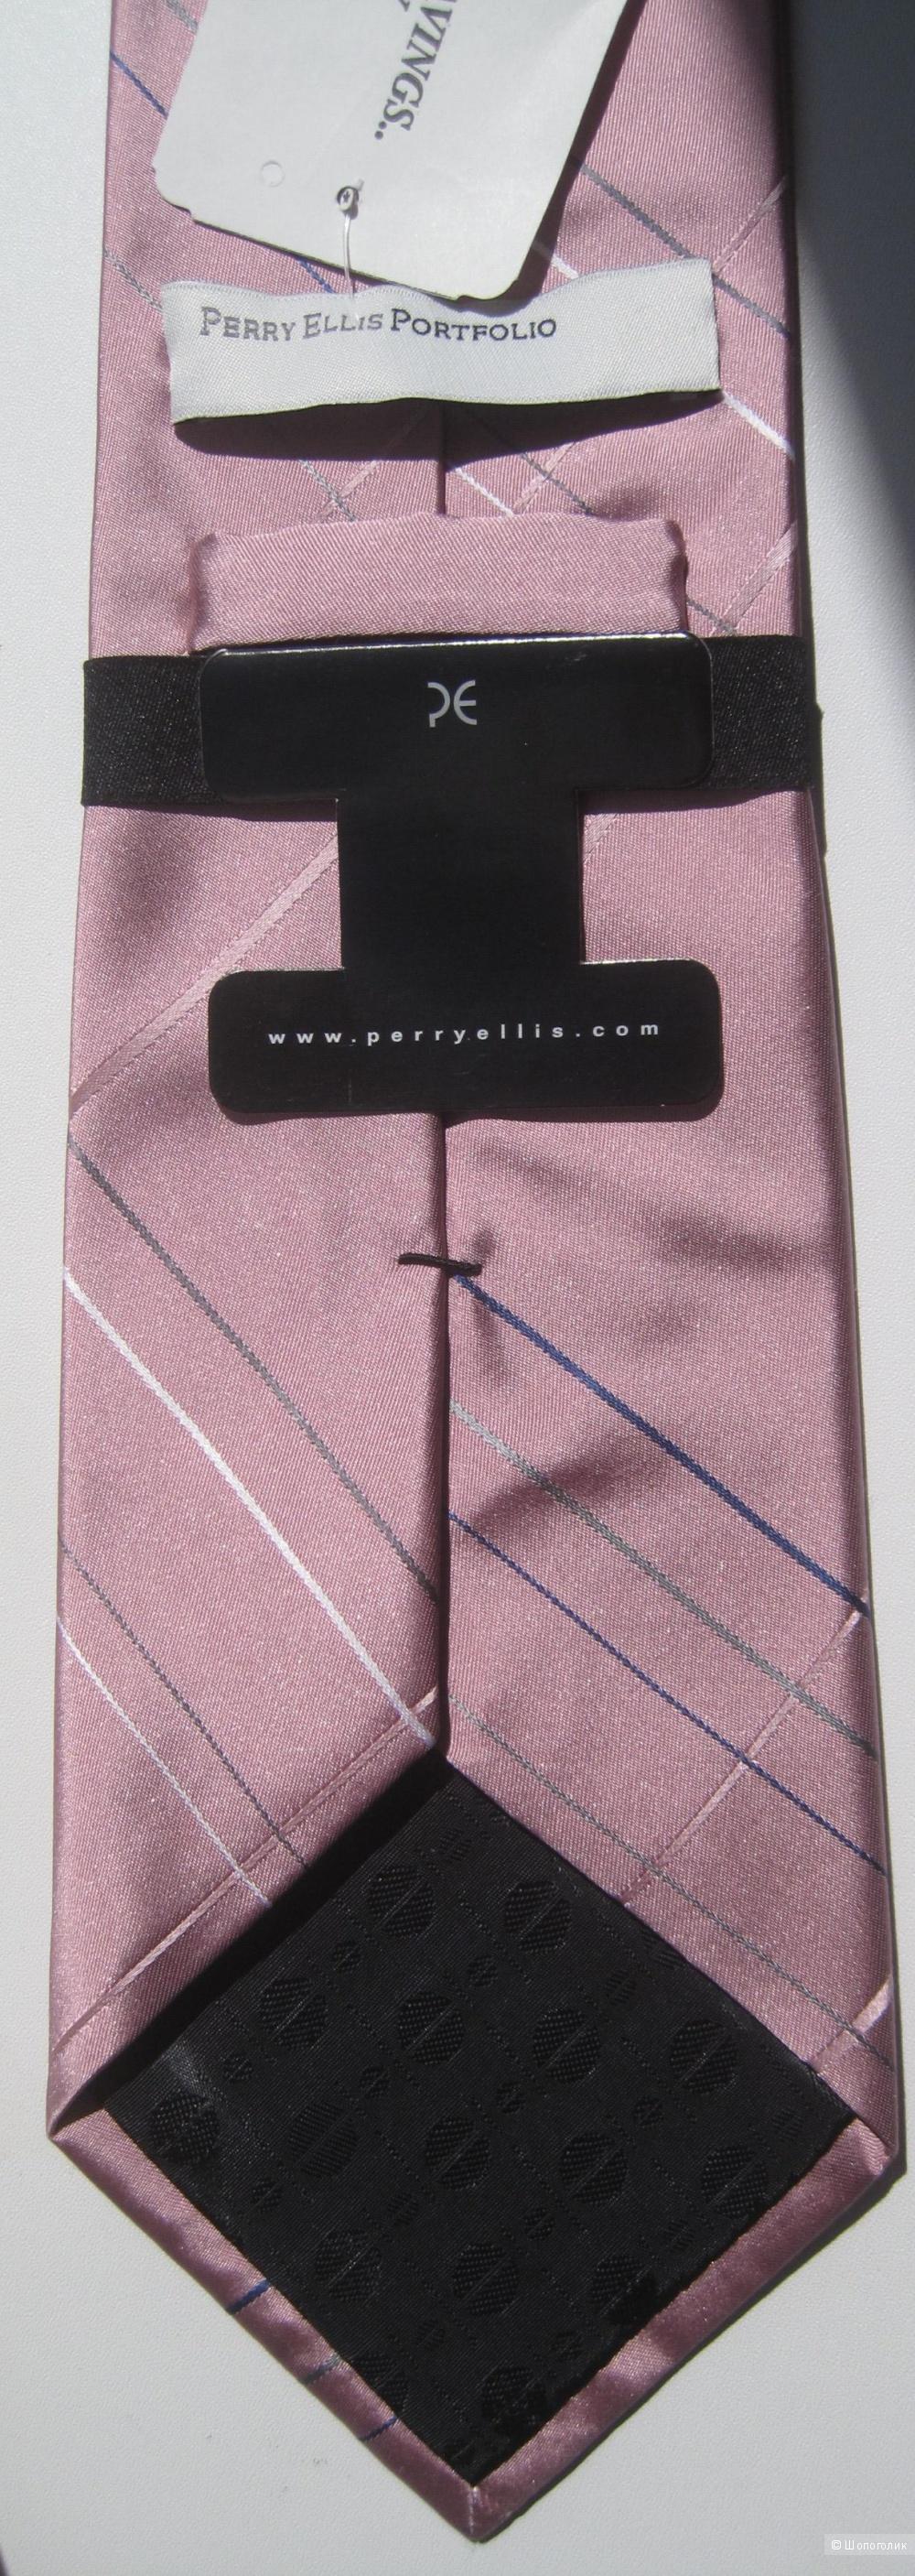 Новый галстук Perry Ellis